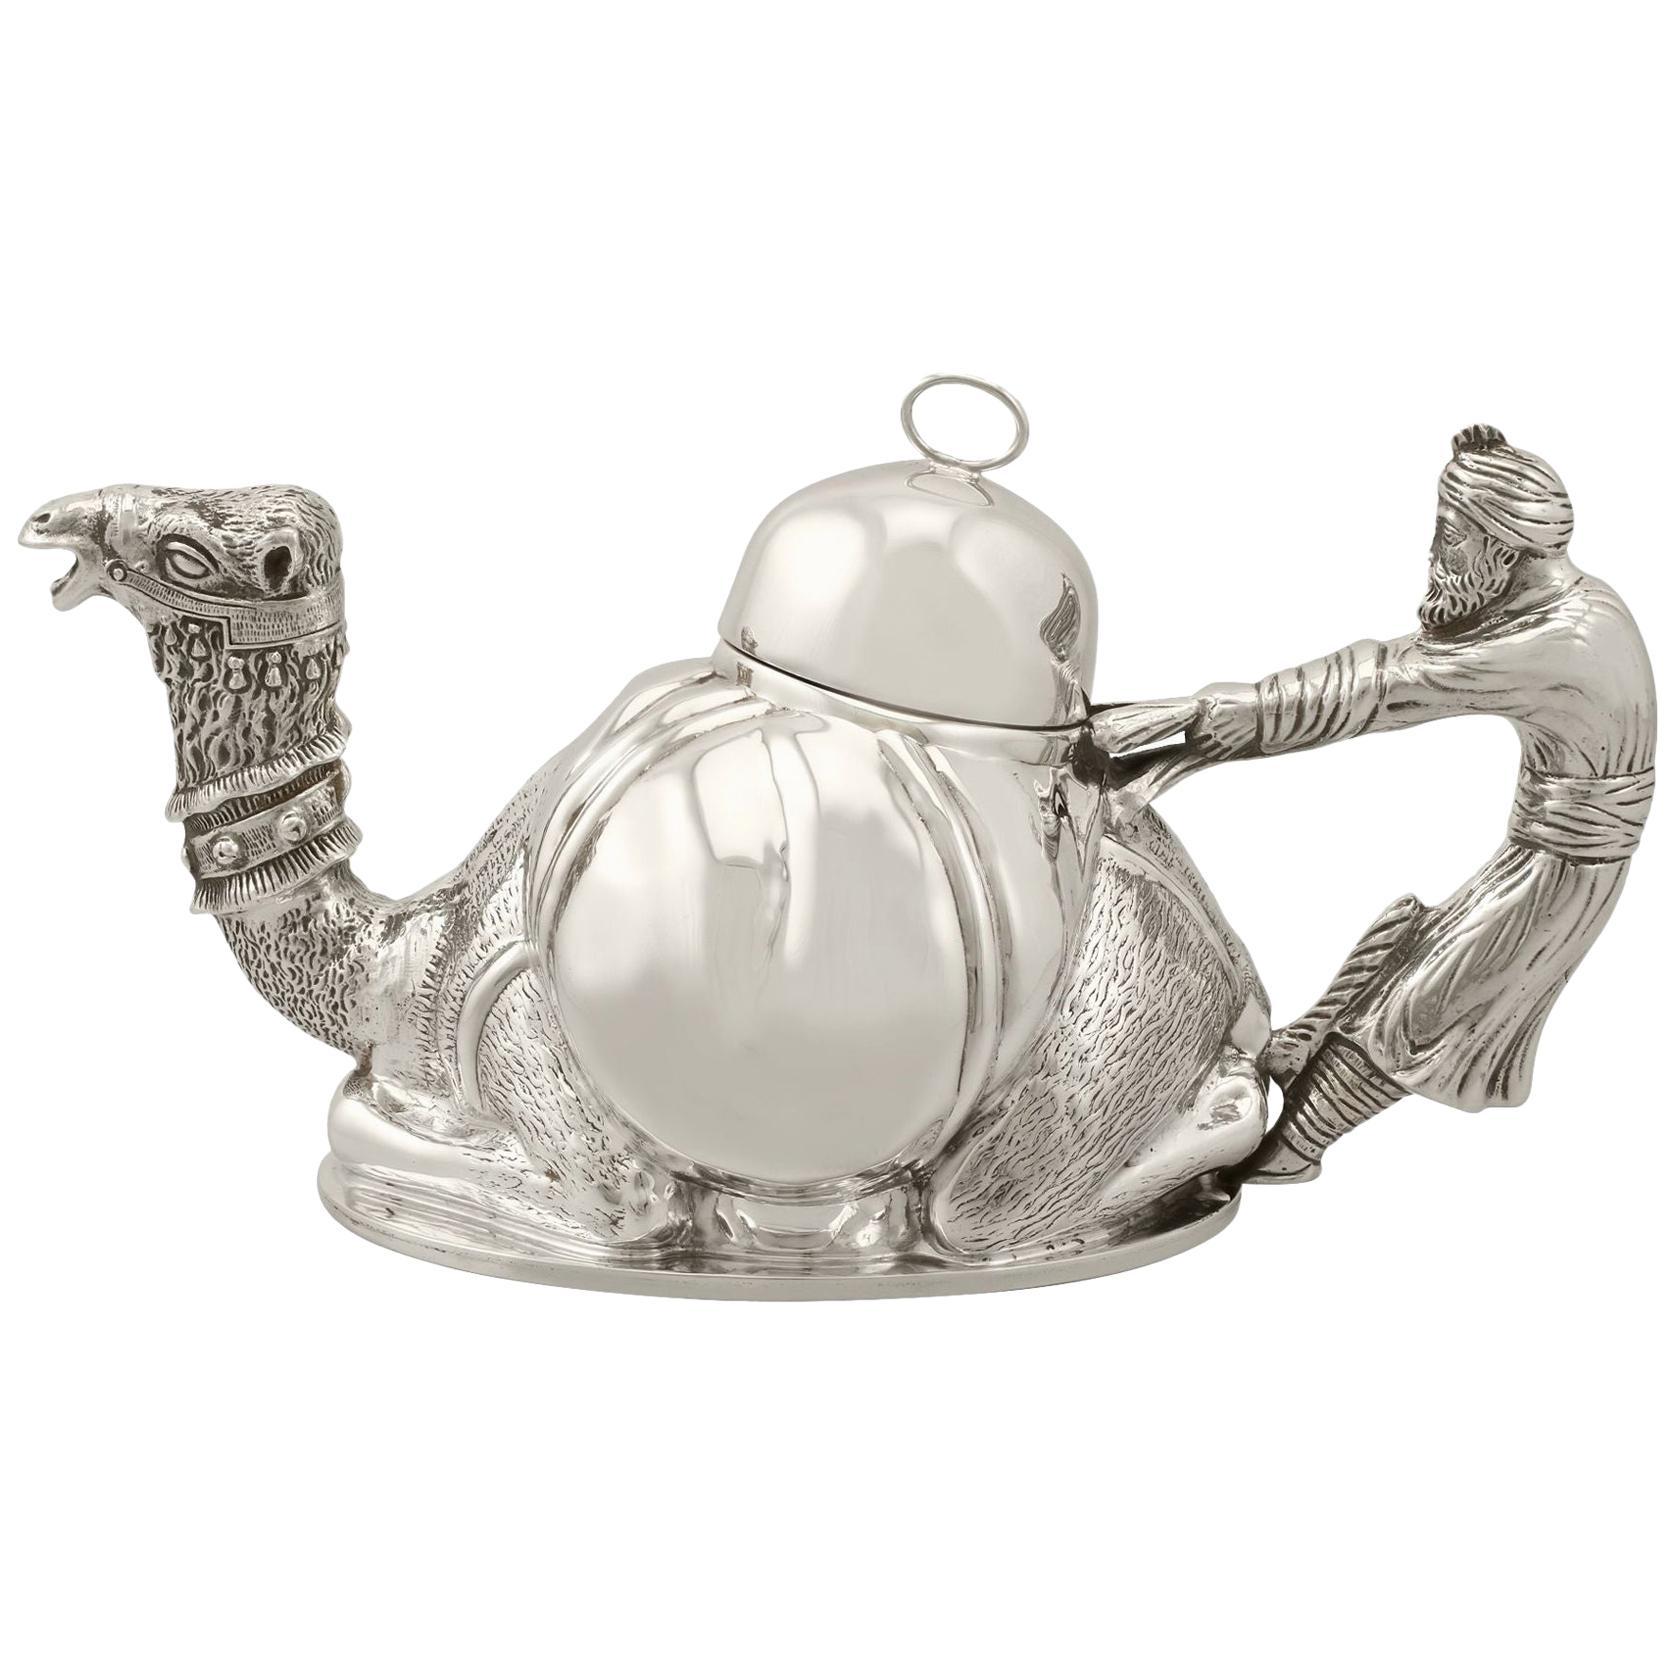 Vintage Italian Sterling Silver Teapot